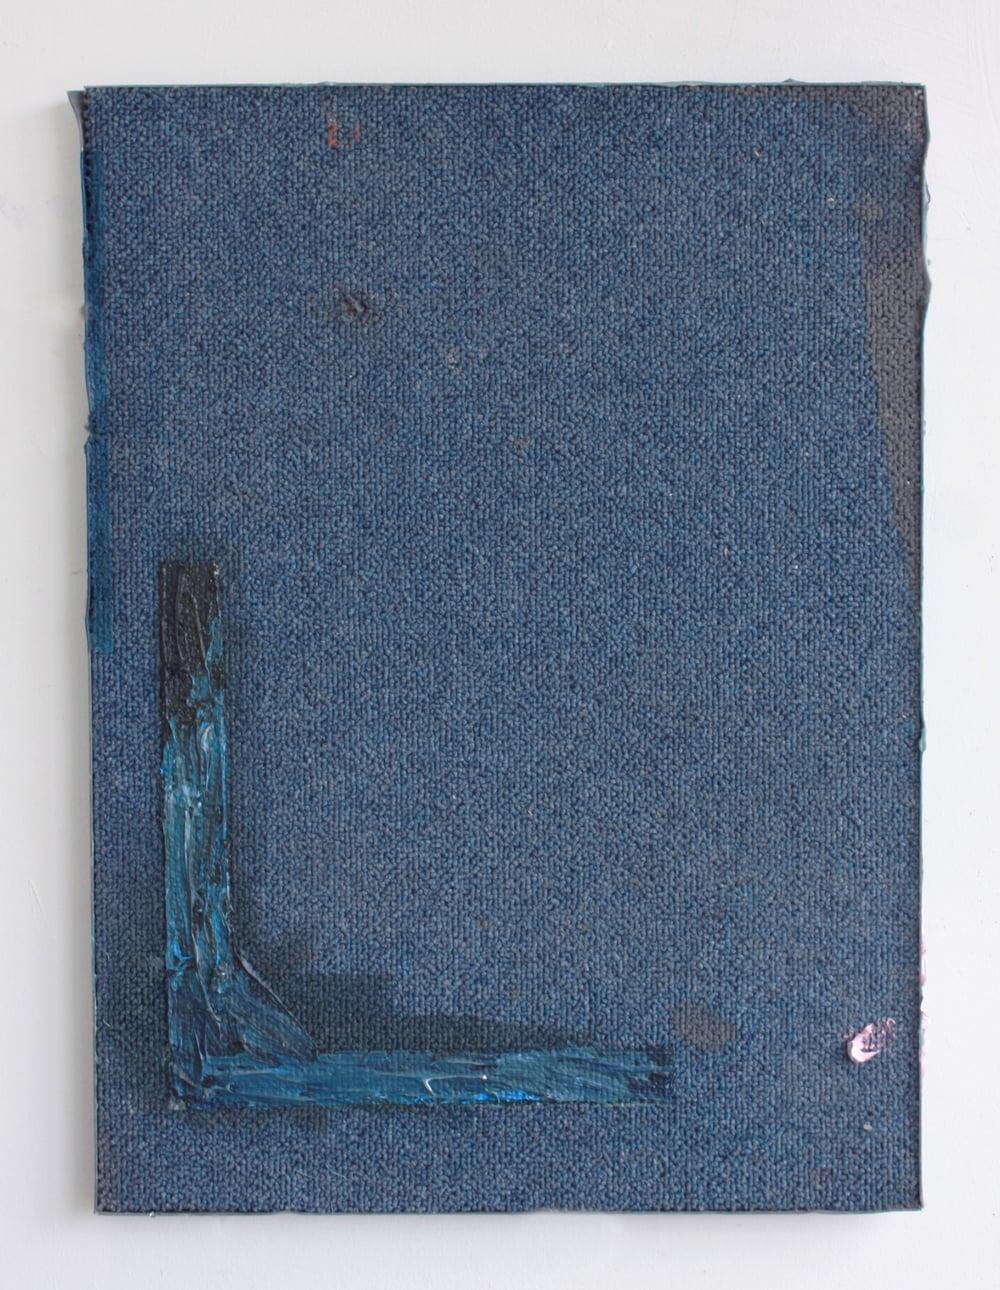 'Untitled' 2014 Oil on carpet tile 32 x 18  x 2cm